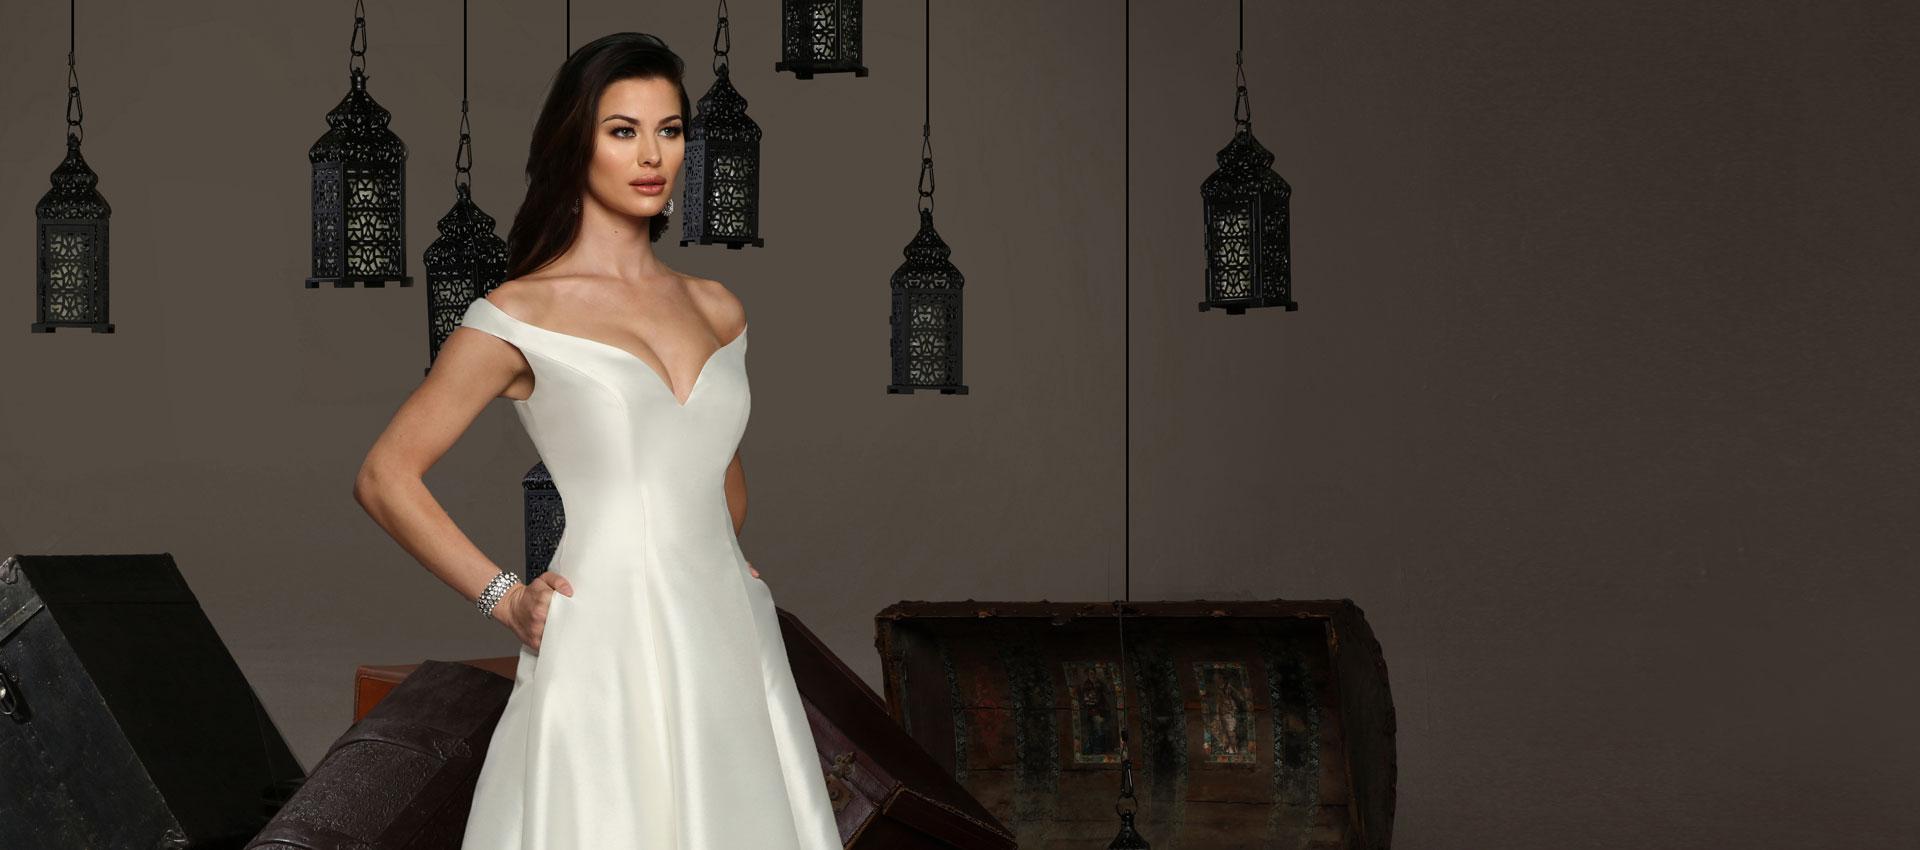 wedding dresses melbourne fl photo - 1